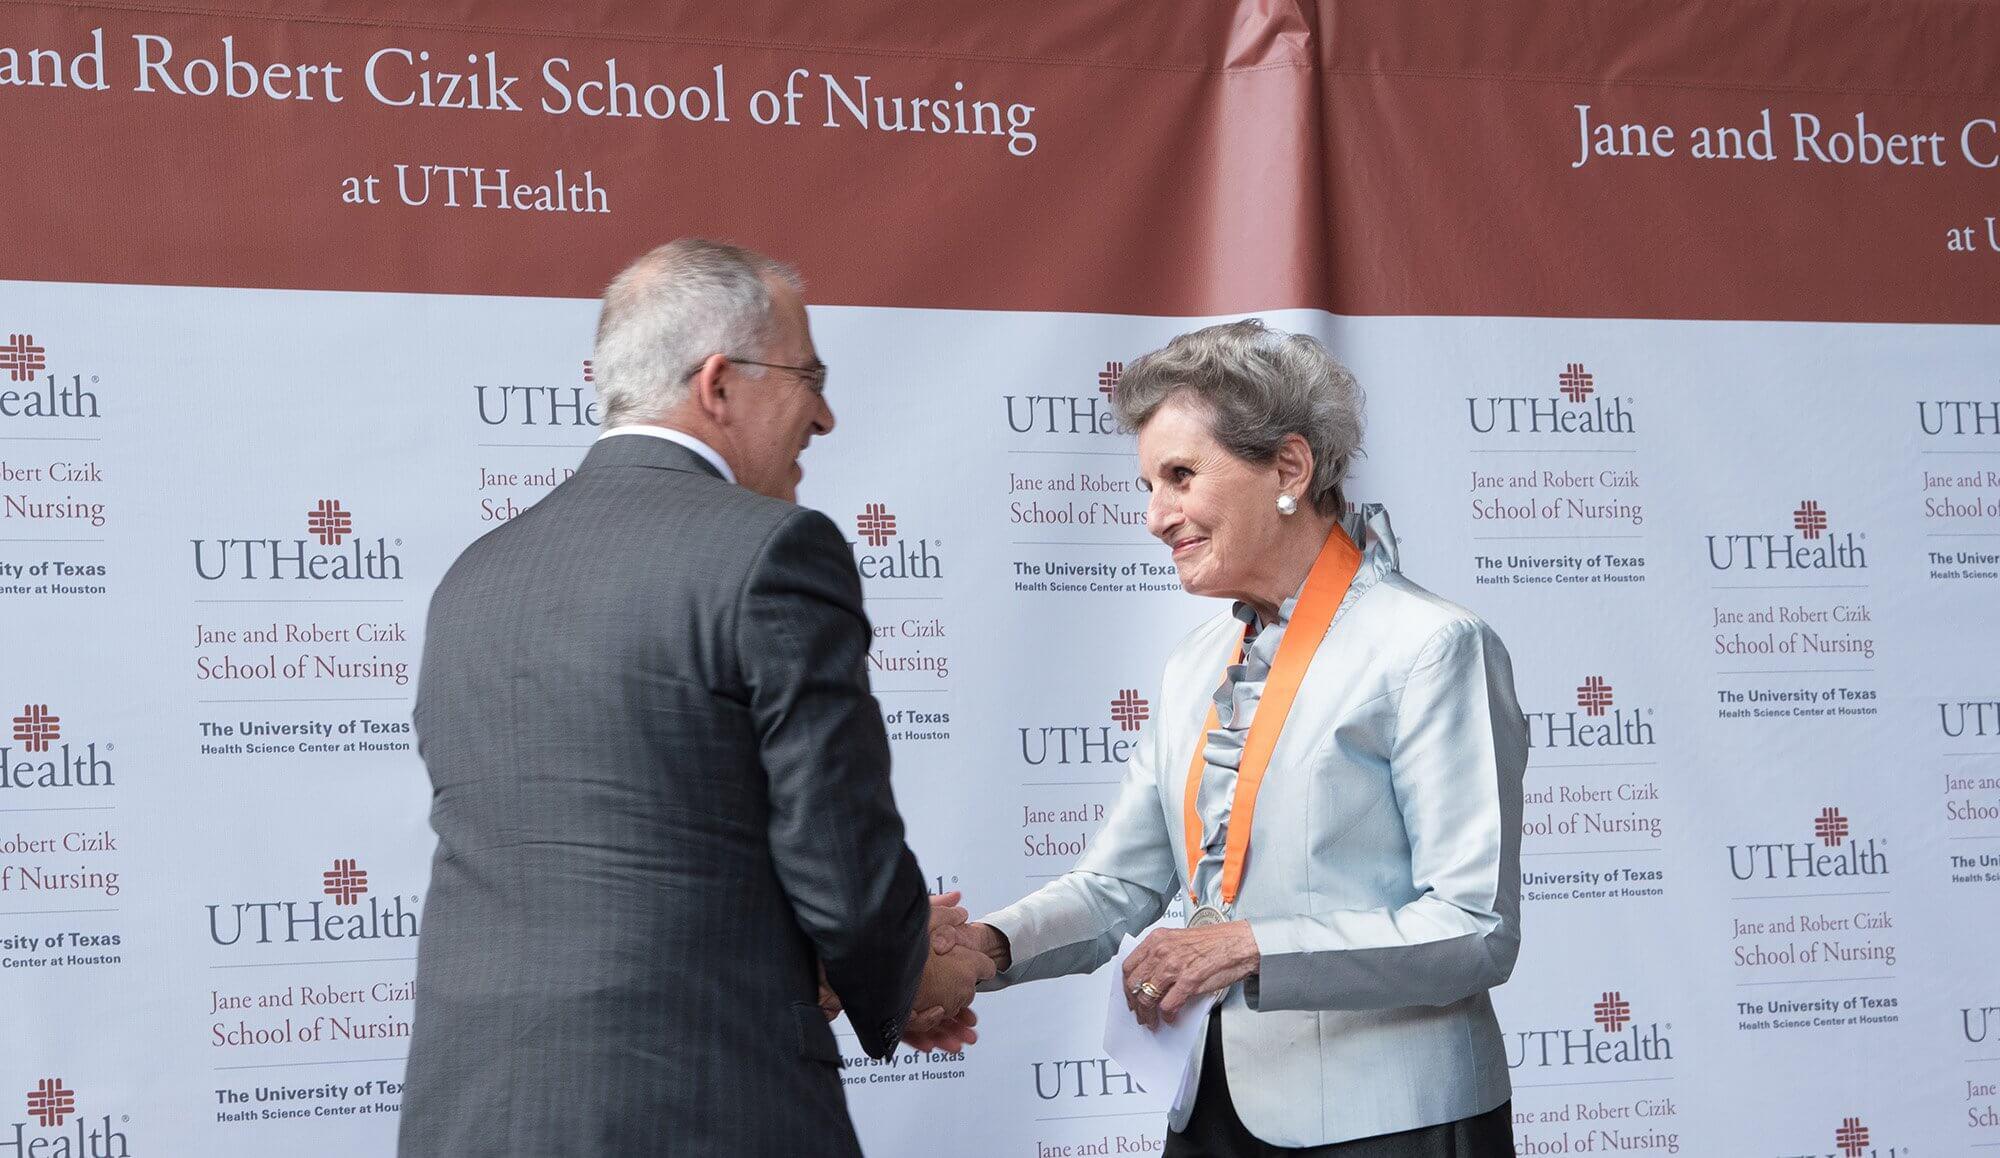 UTHealth President Giuseppe Colasurdo., M.D., and Jane Cizik after her remarks. Photo by Katy Umana, UTHealth.